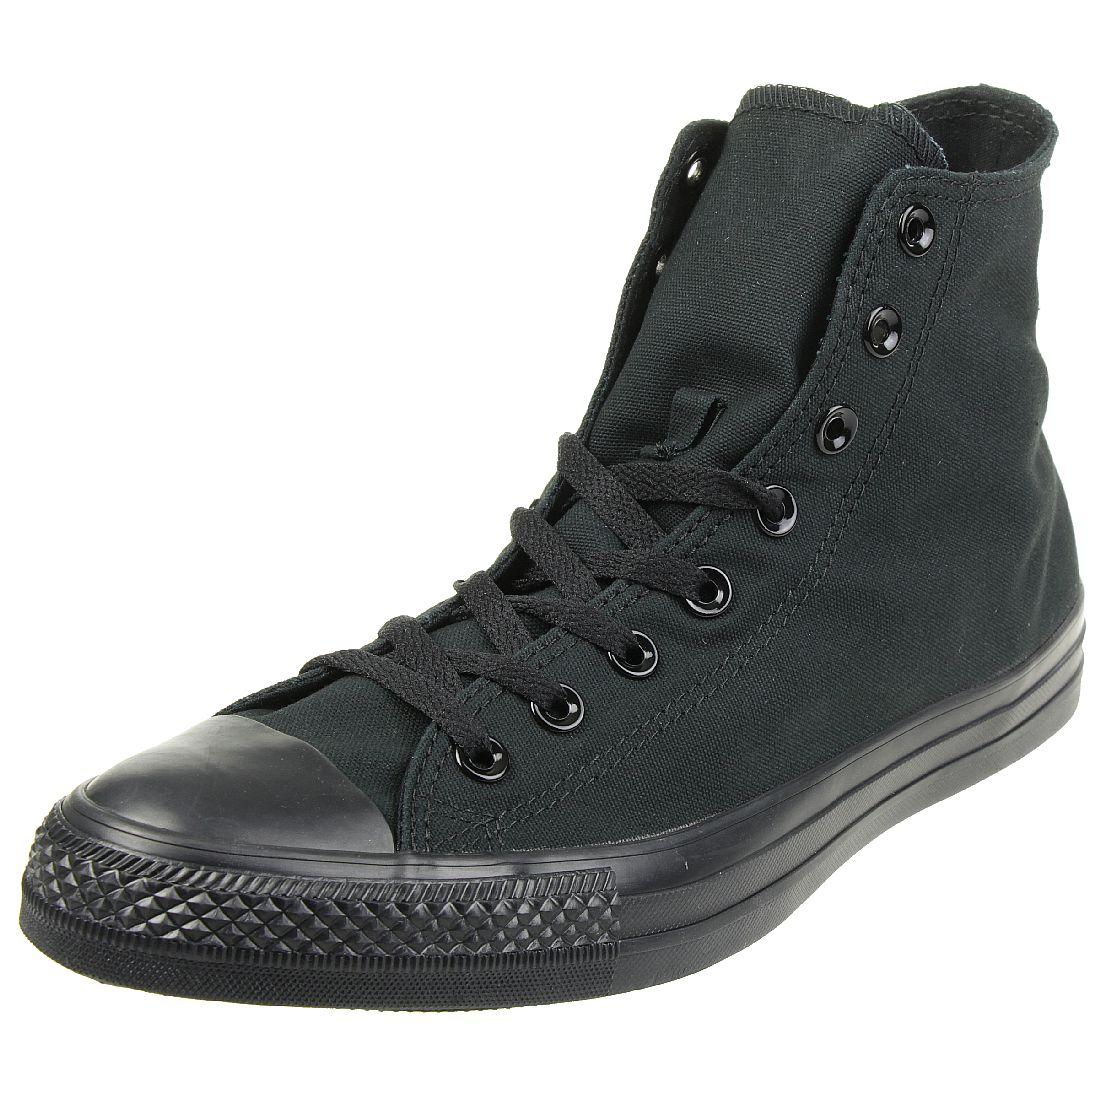 Converse C Taylor A/S HI Chuck Schuhe Sneaker canvas Schwarz M3310C ...